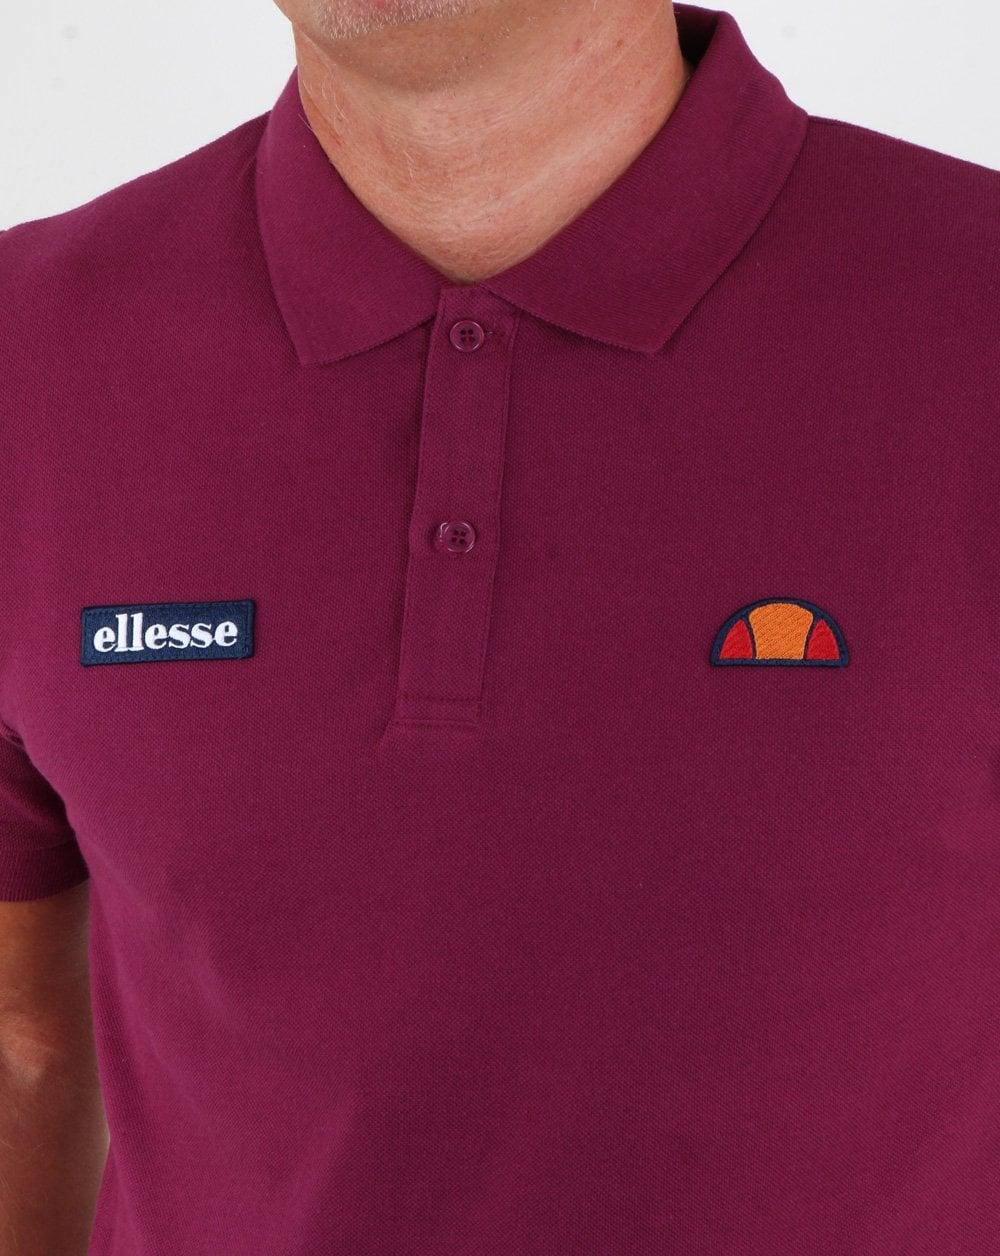 b4380cec Ellesse Heritage Polo Shirt Purple